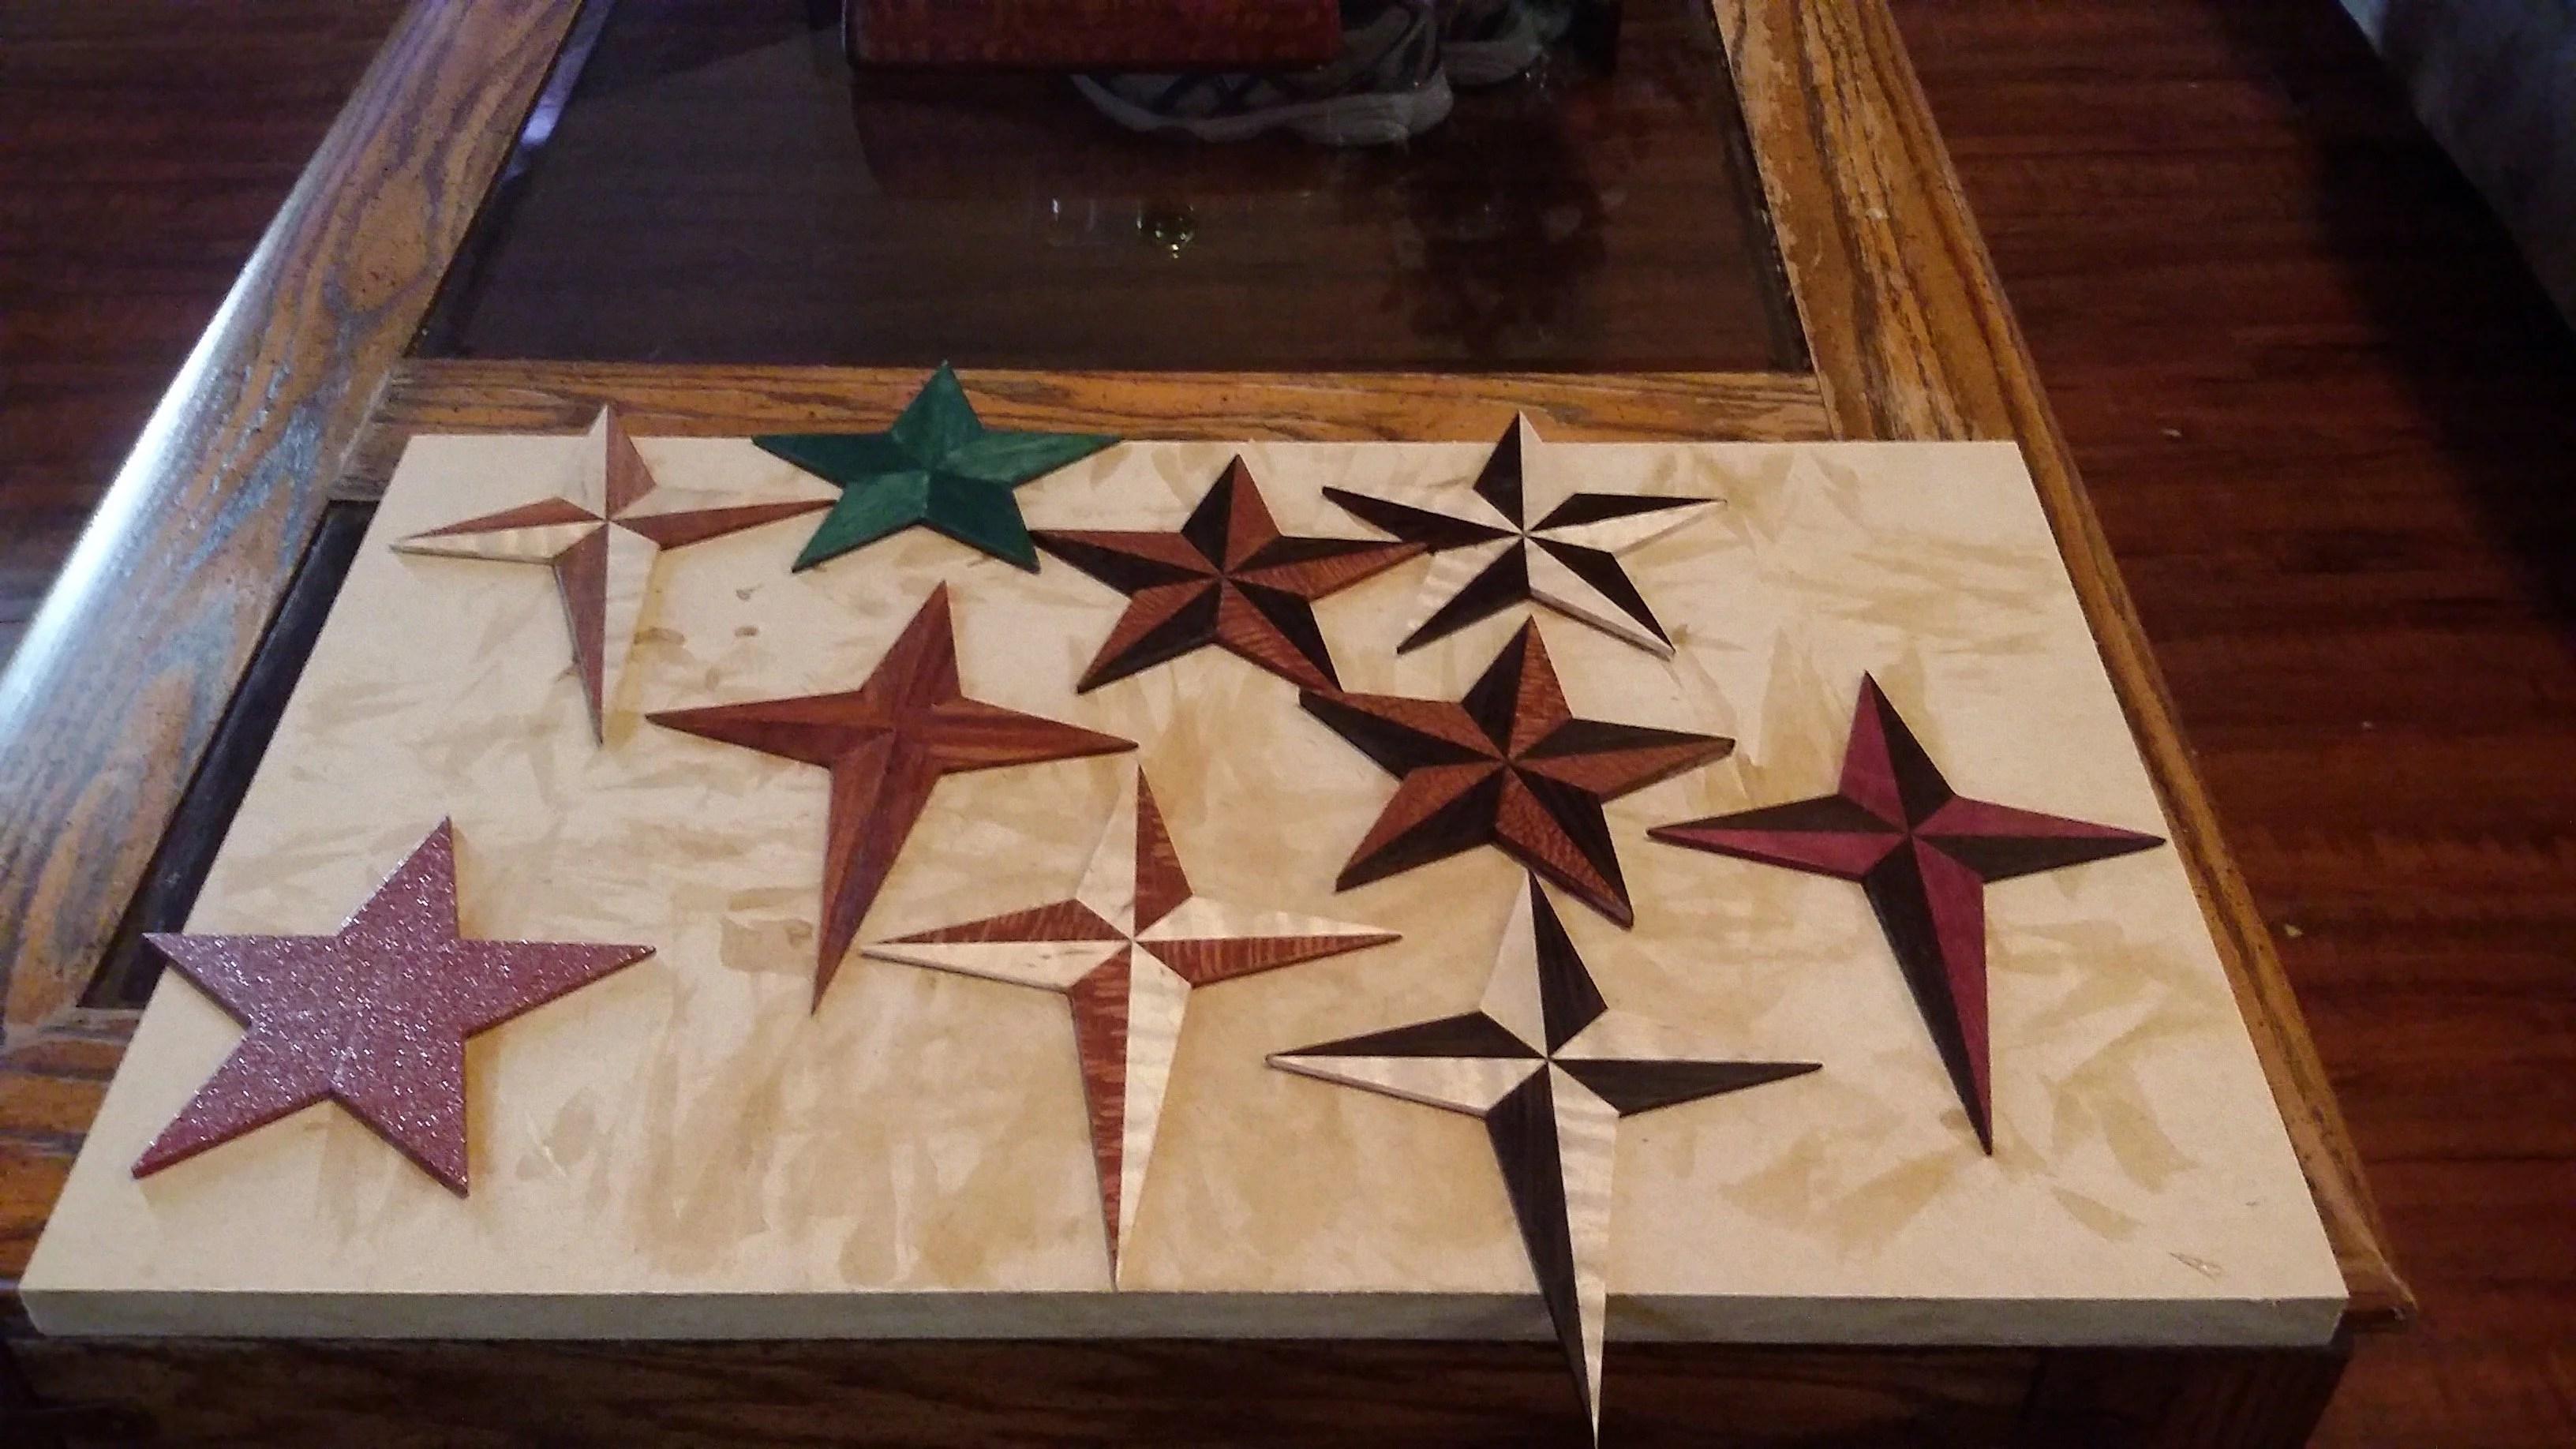 Christmas Star by Danny Allen